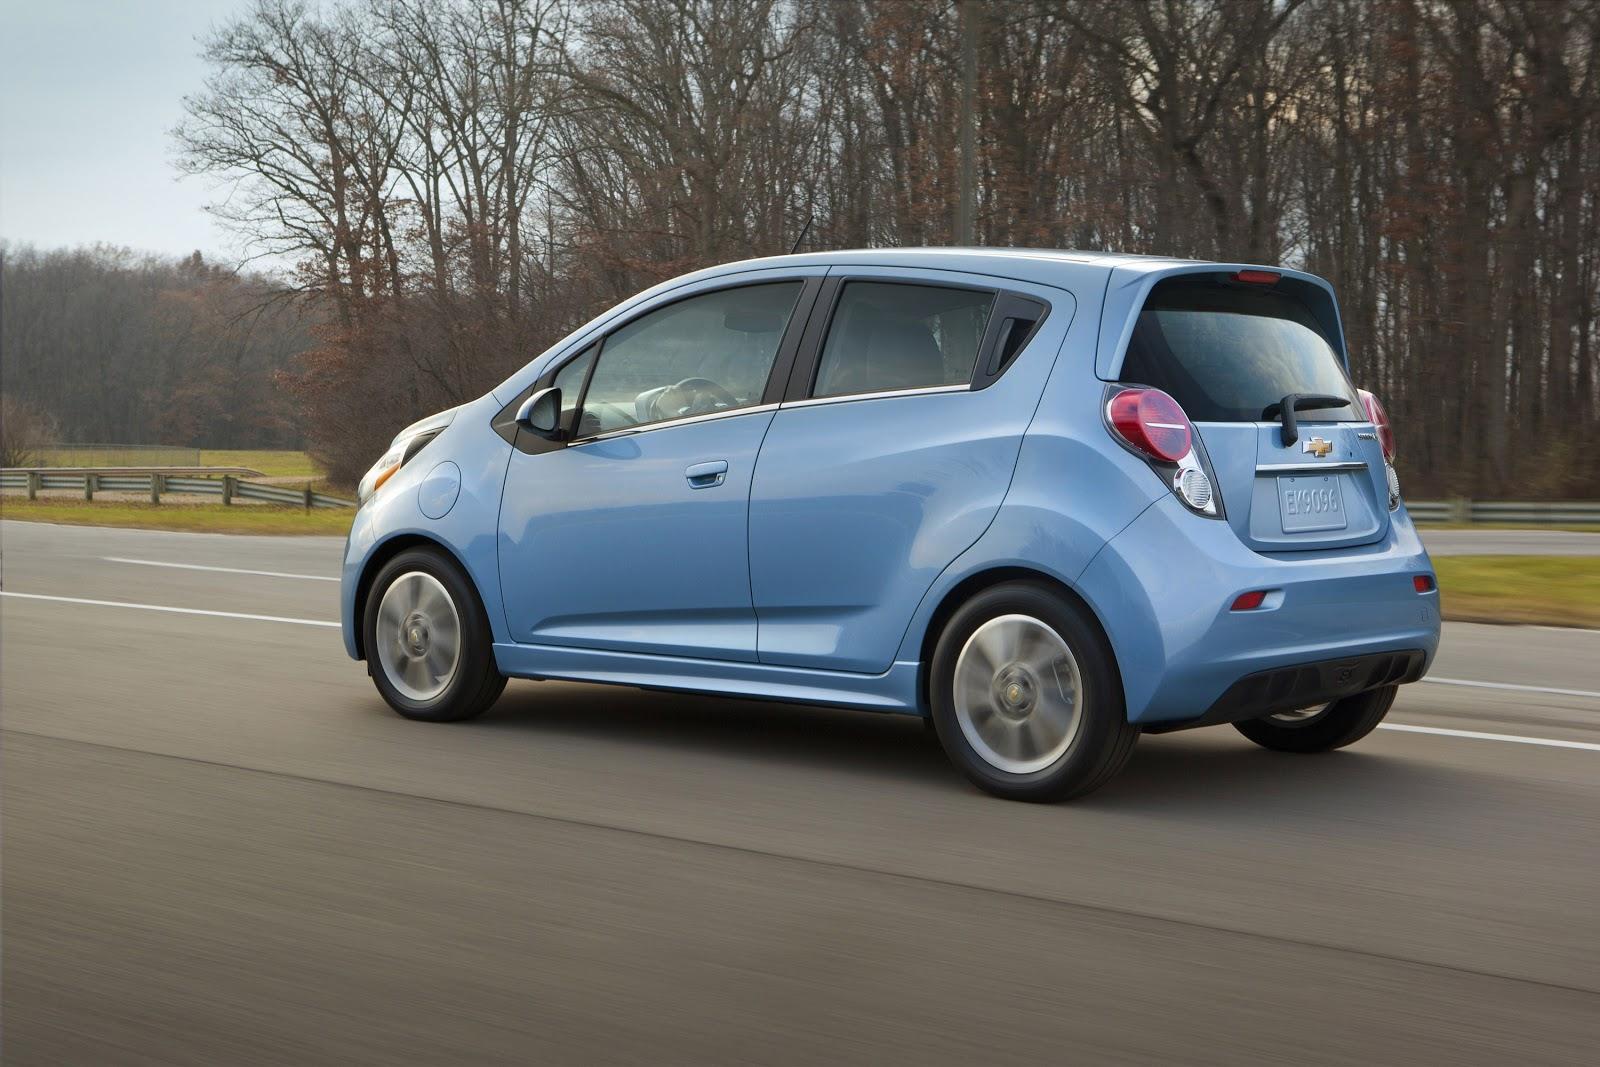 2014 chevrolet spark ev auto cars concept. Cars Review. Best American Auto & Cars Review